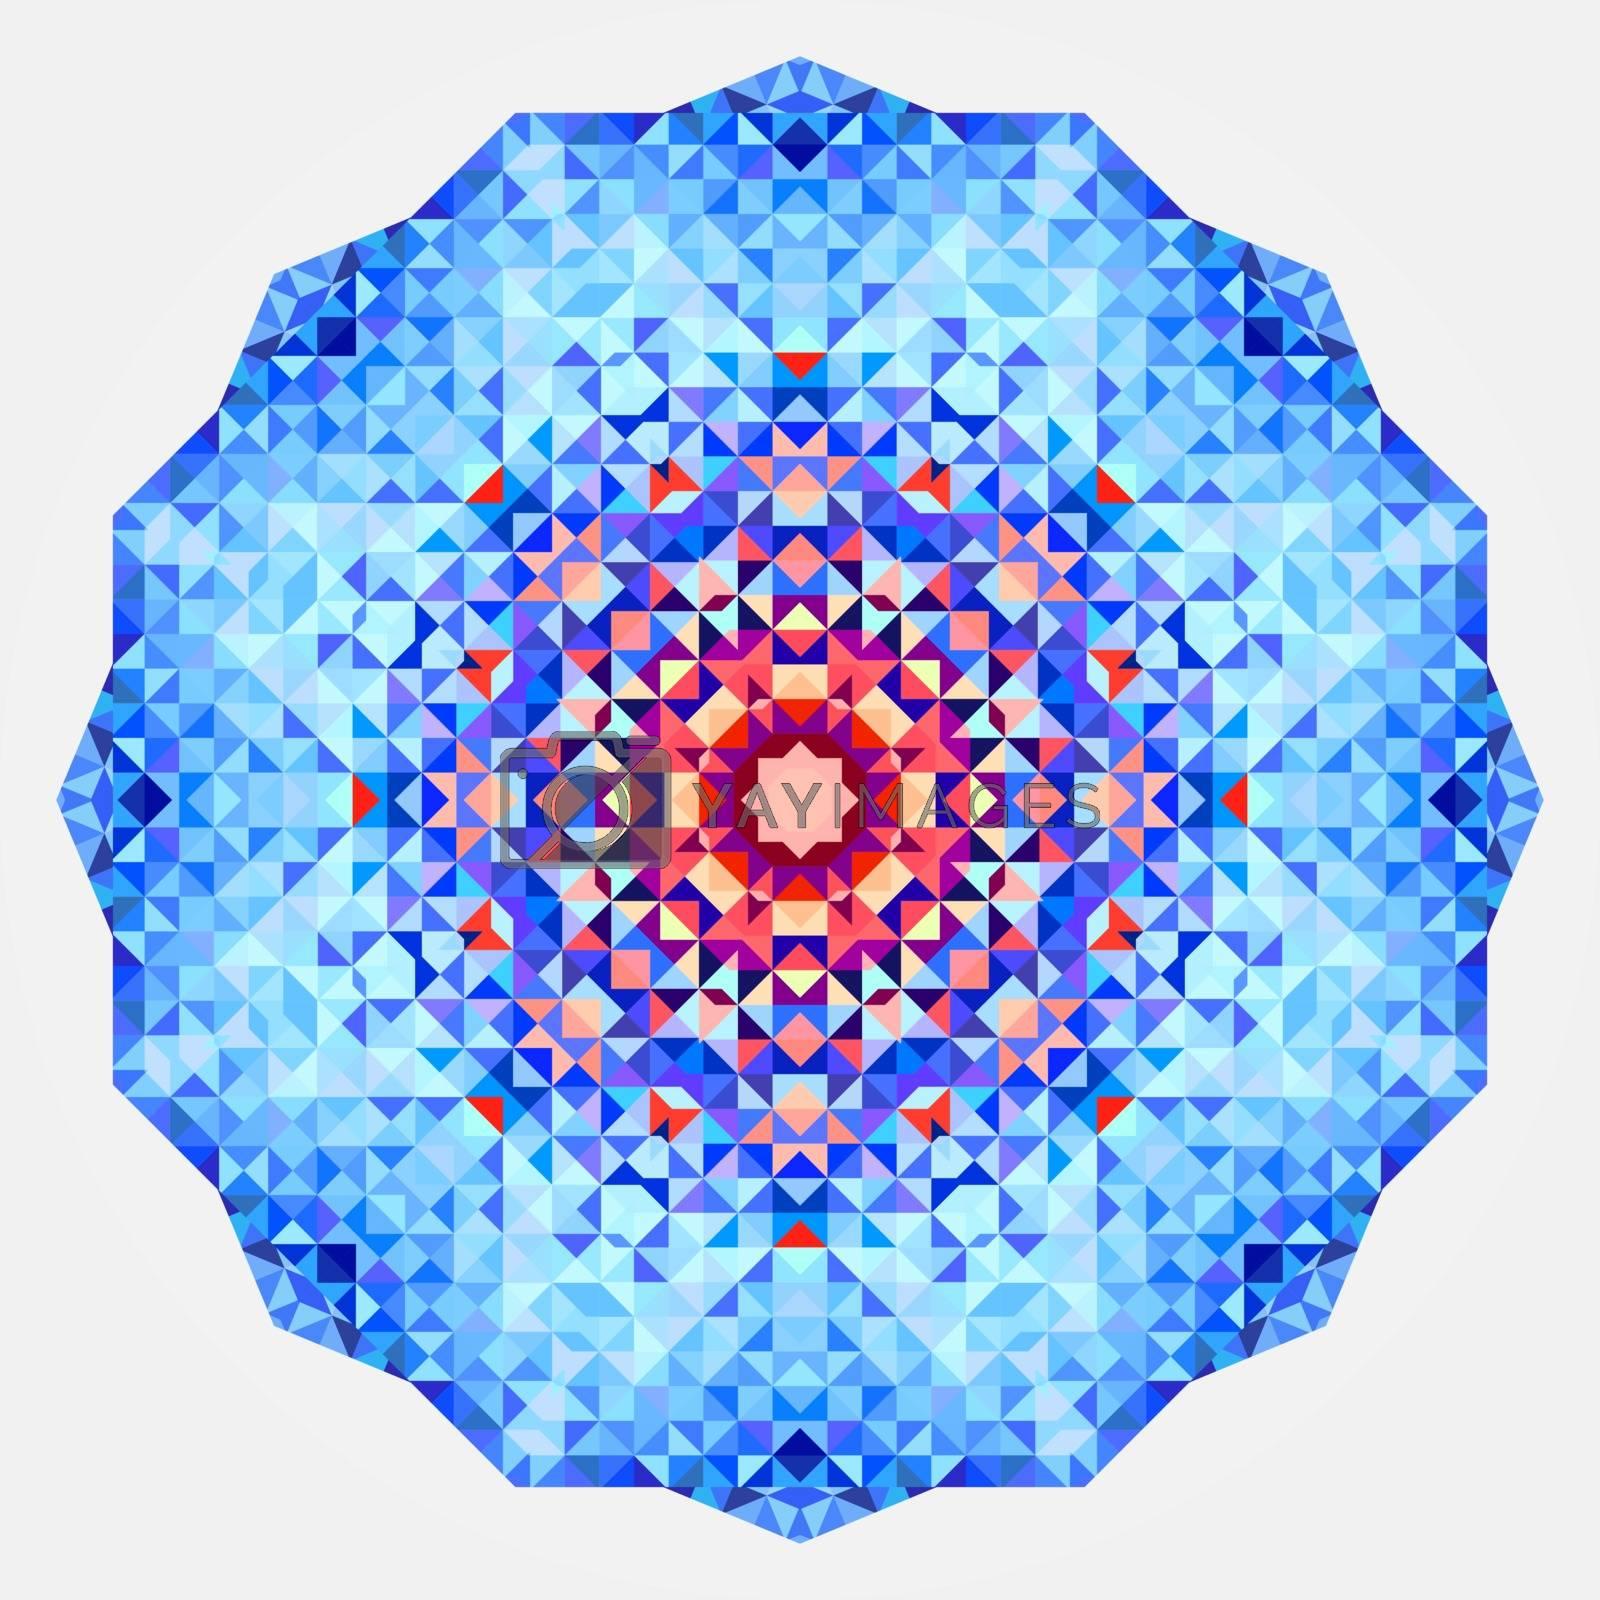 Round symmetrical digital ornament. Abstract Blue Red Mandala.